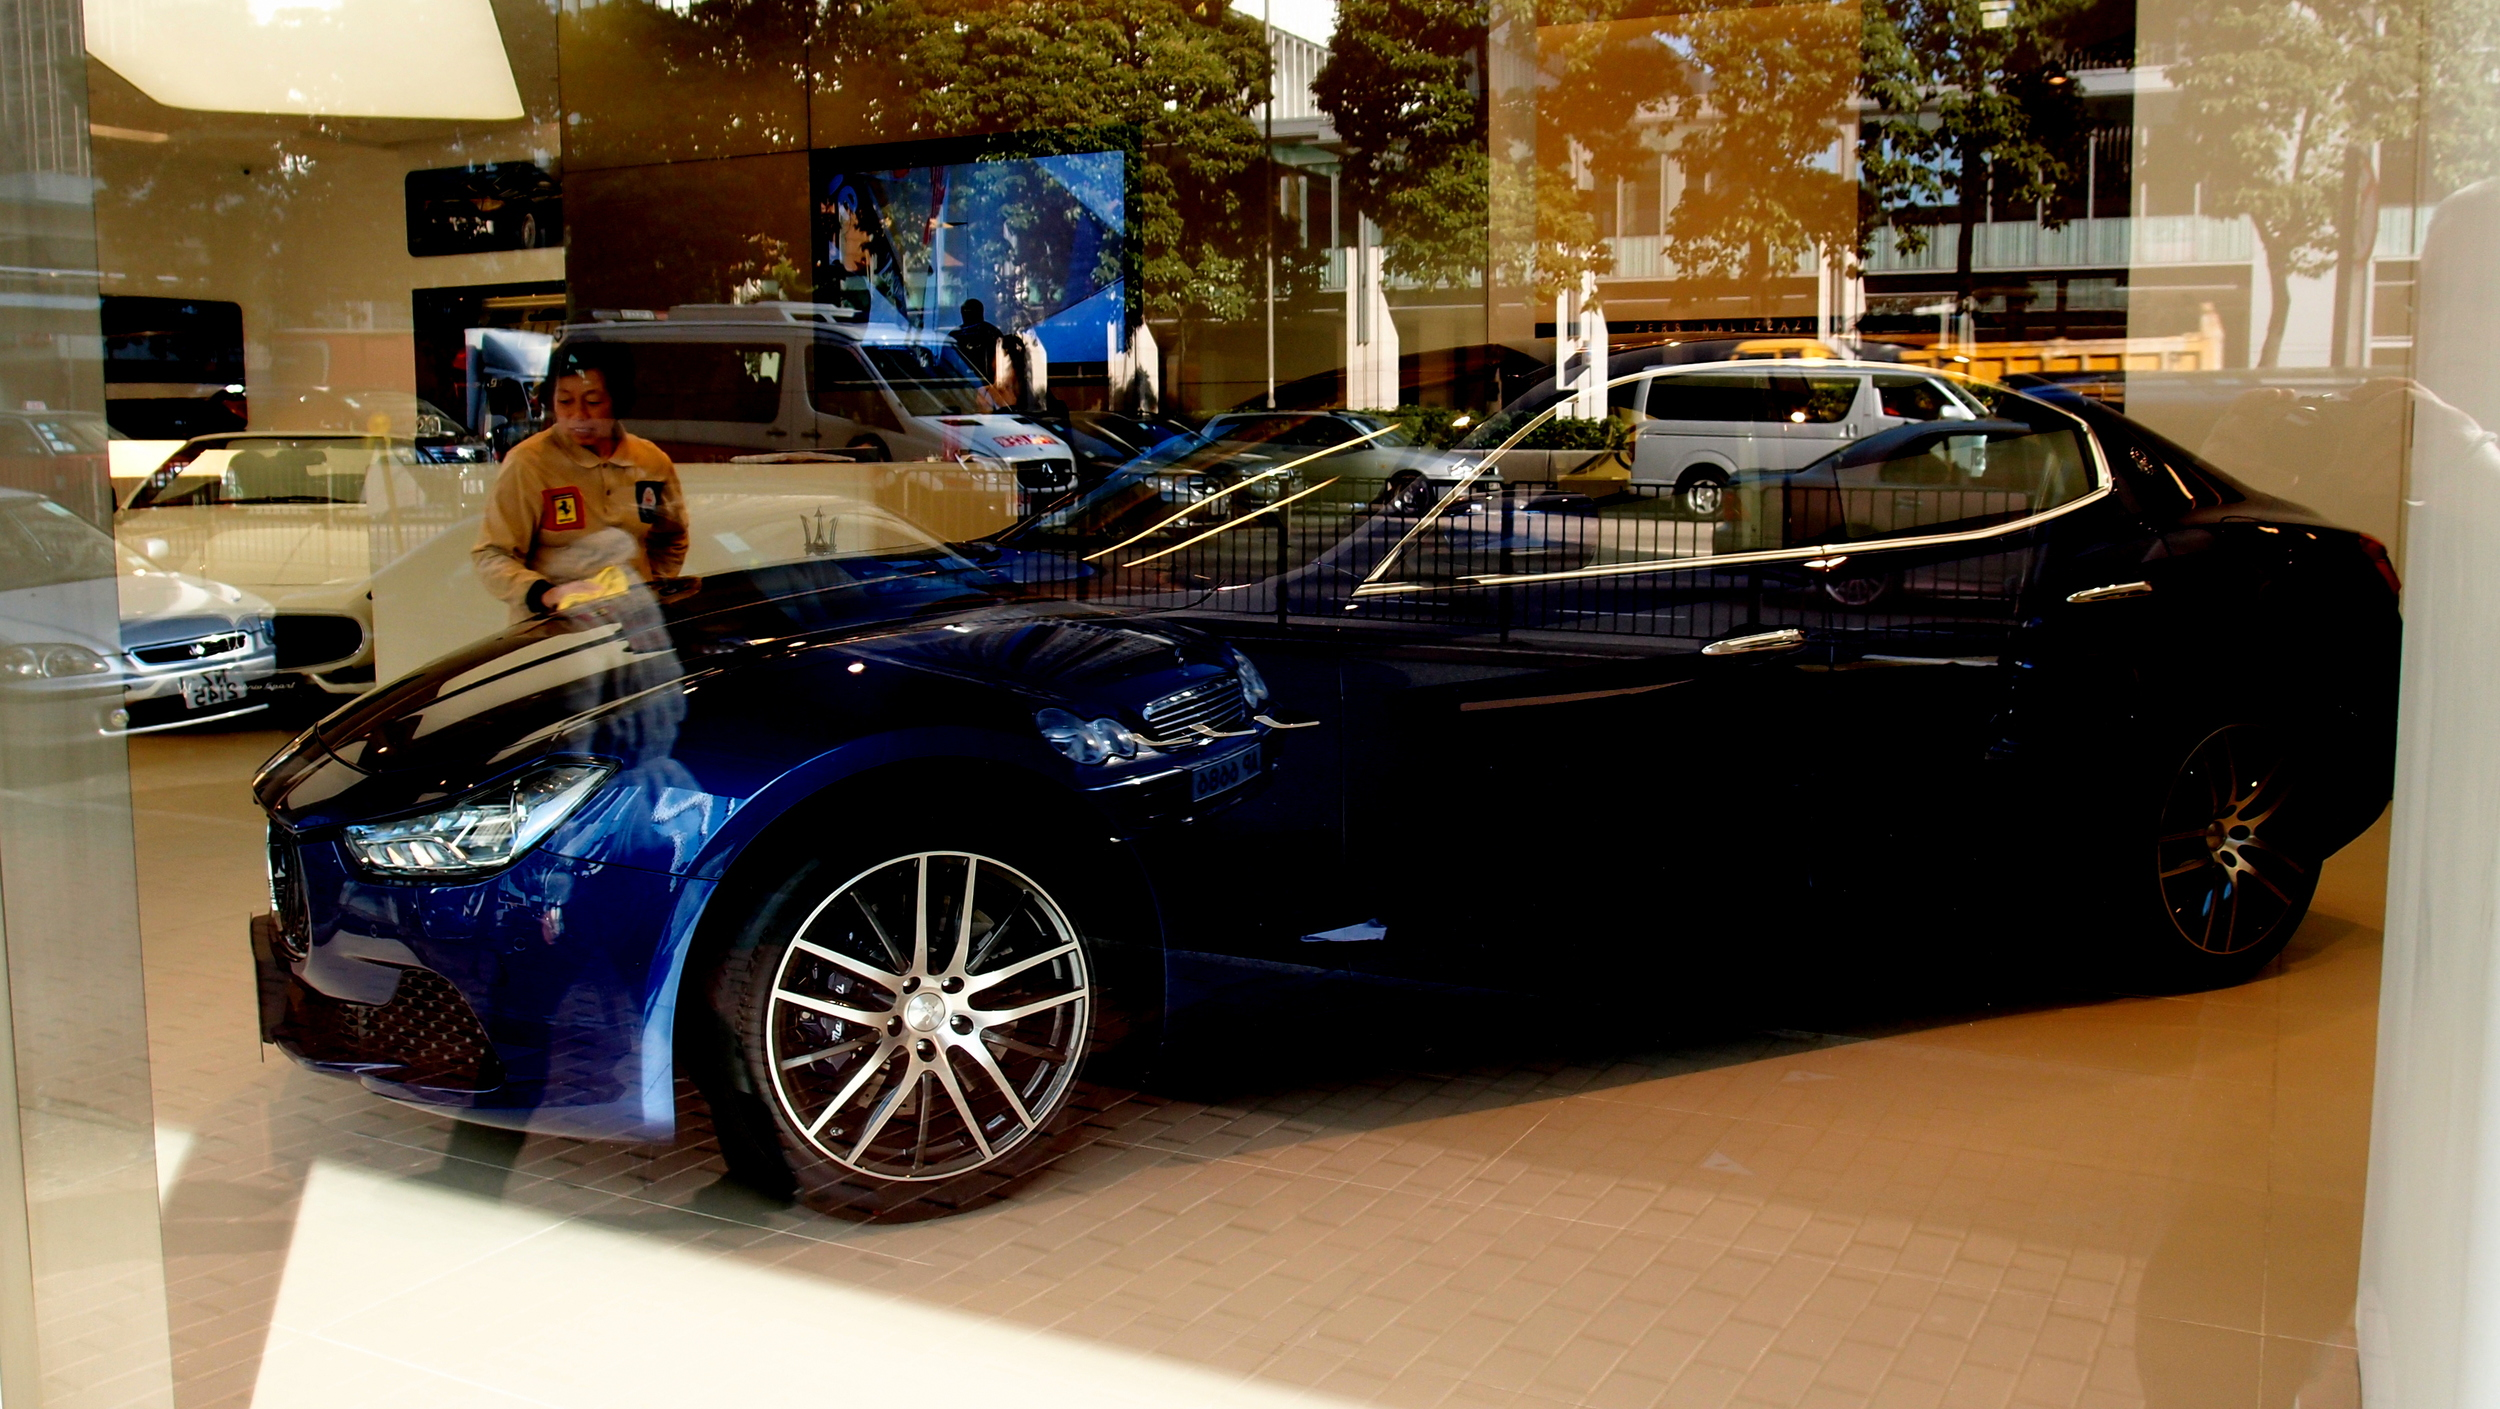 A Karate Kid moment, wax on, wax off... nice car by the way - I do love Maserati's.